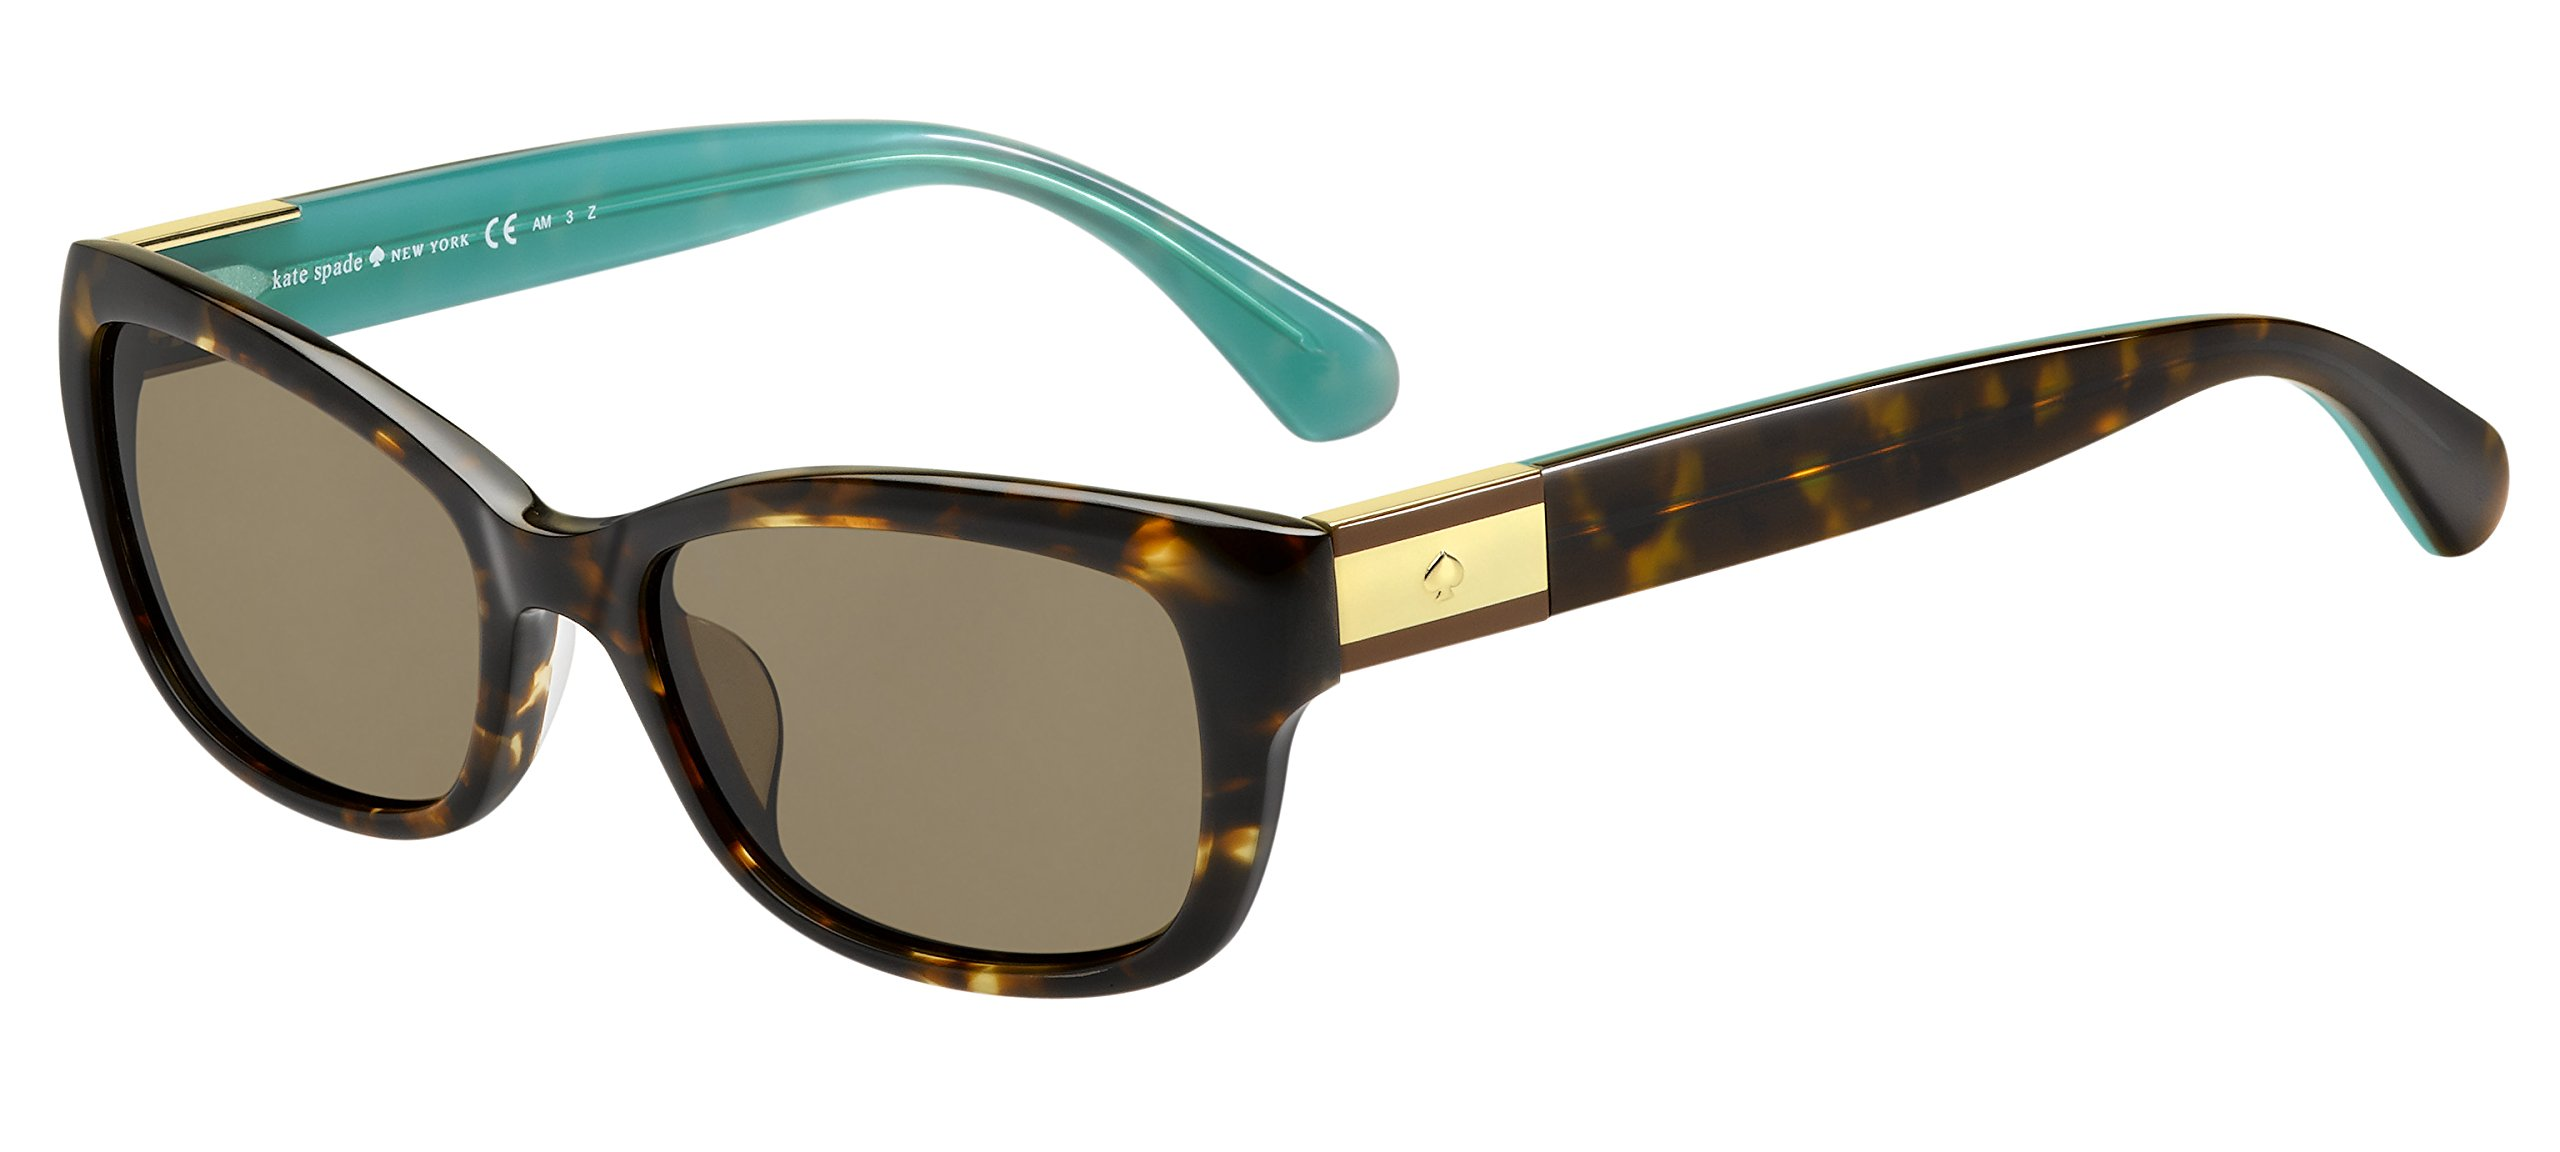 Kate Spade Women's Marilee/p/s Polarized Rectangular Sunglasses, Havana Turquoise/Bronze Polarized, 53 mm